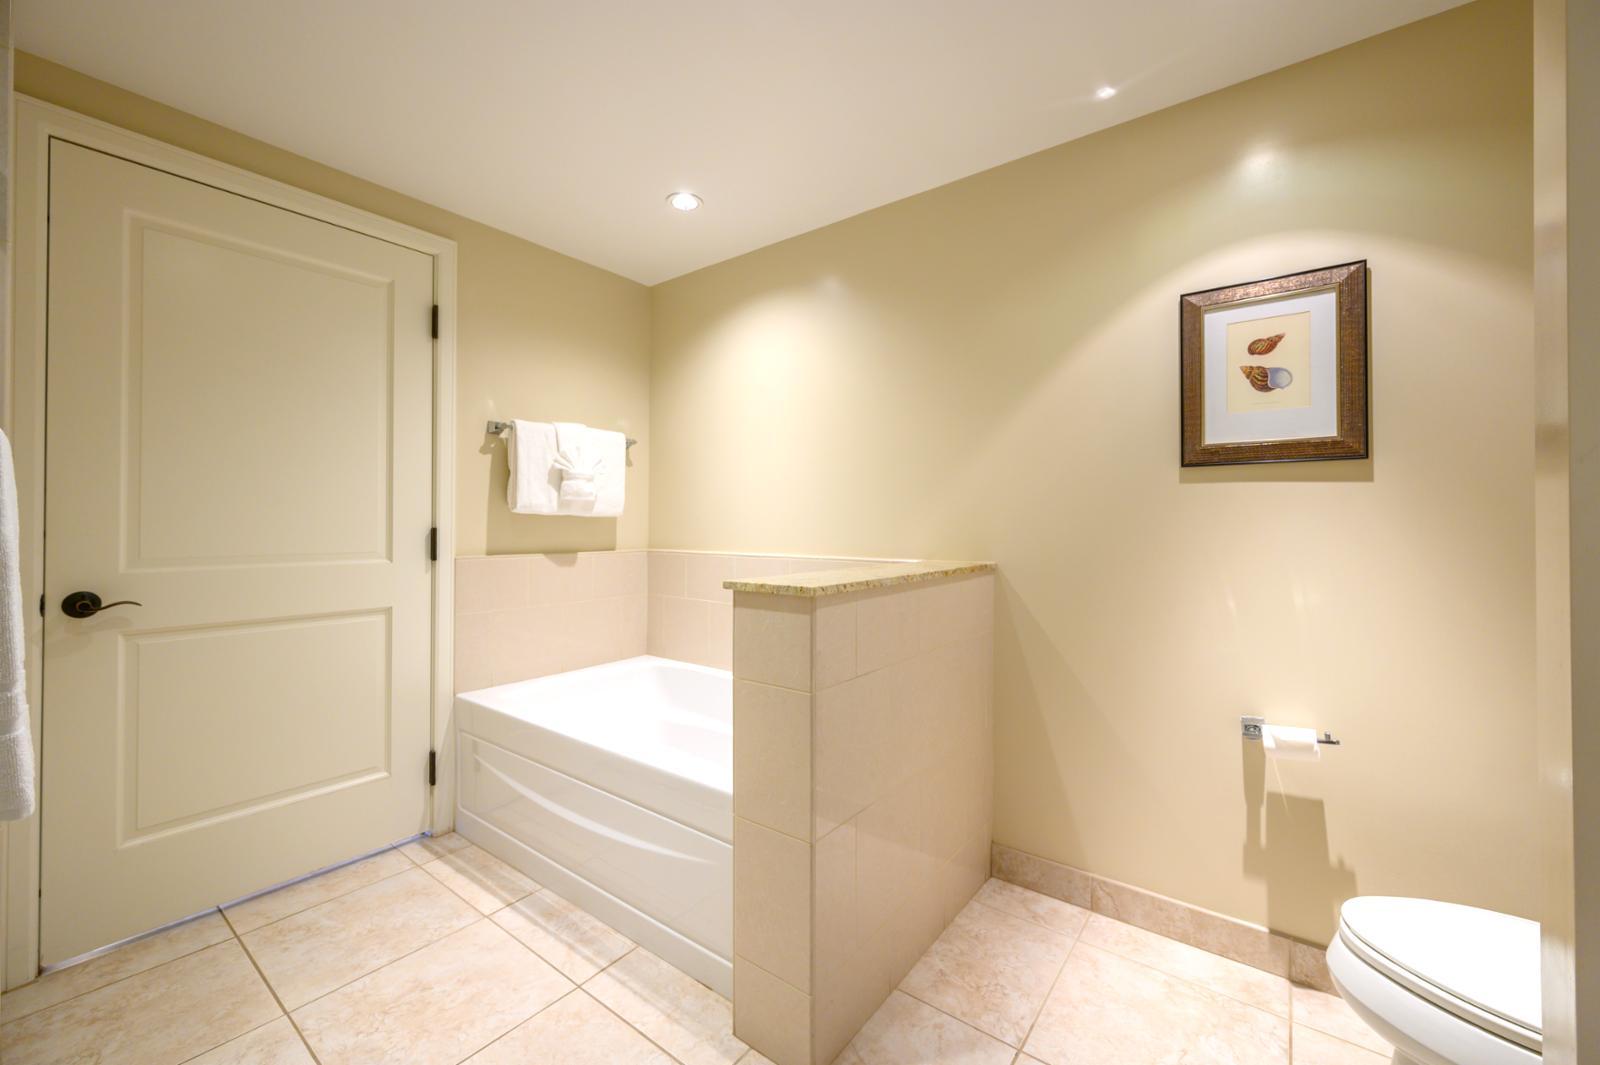 Second Bathroom with double vanity